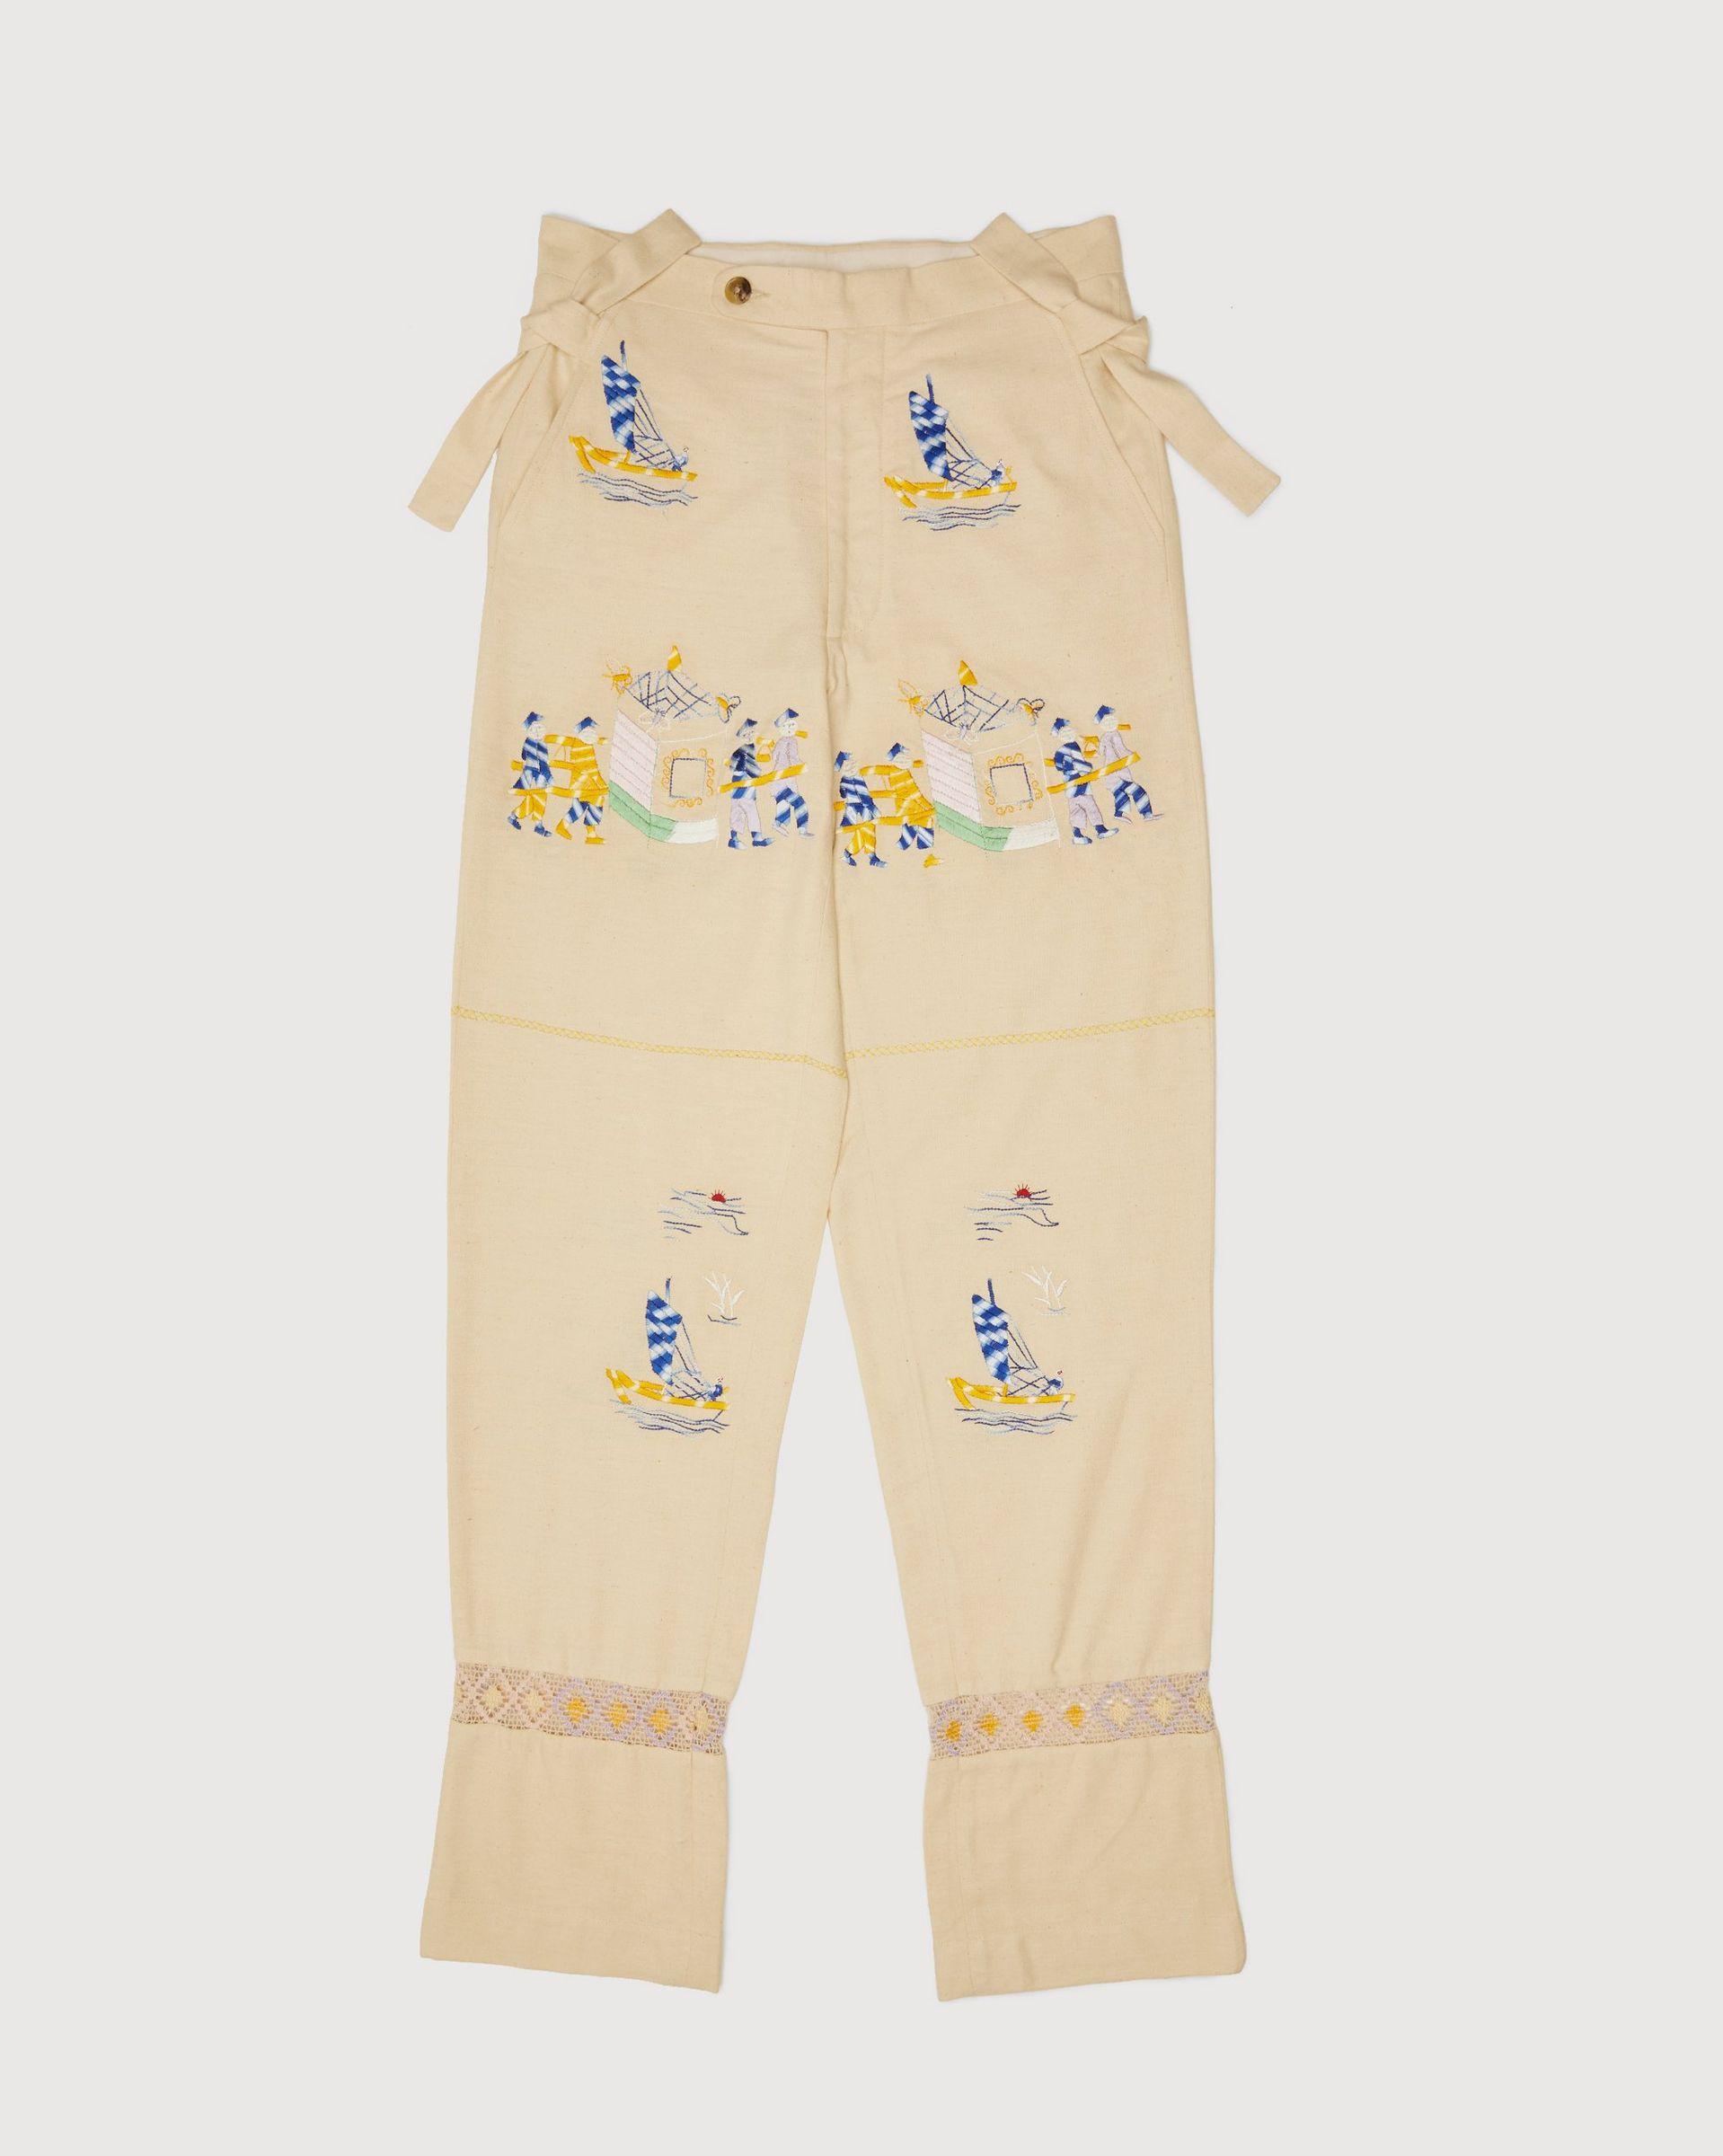 BODE - Sailing Tableau Trousers Tan - Image 1